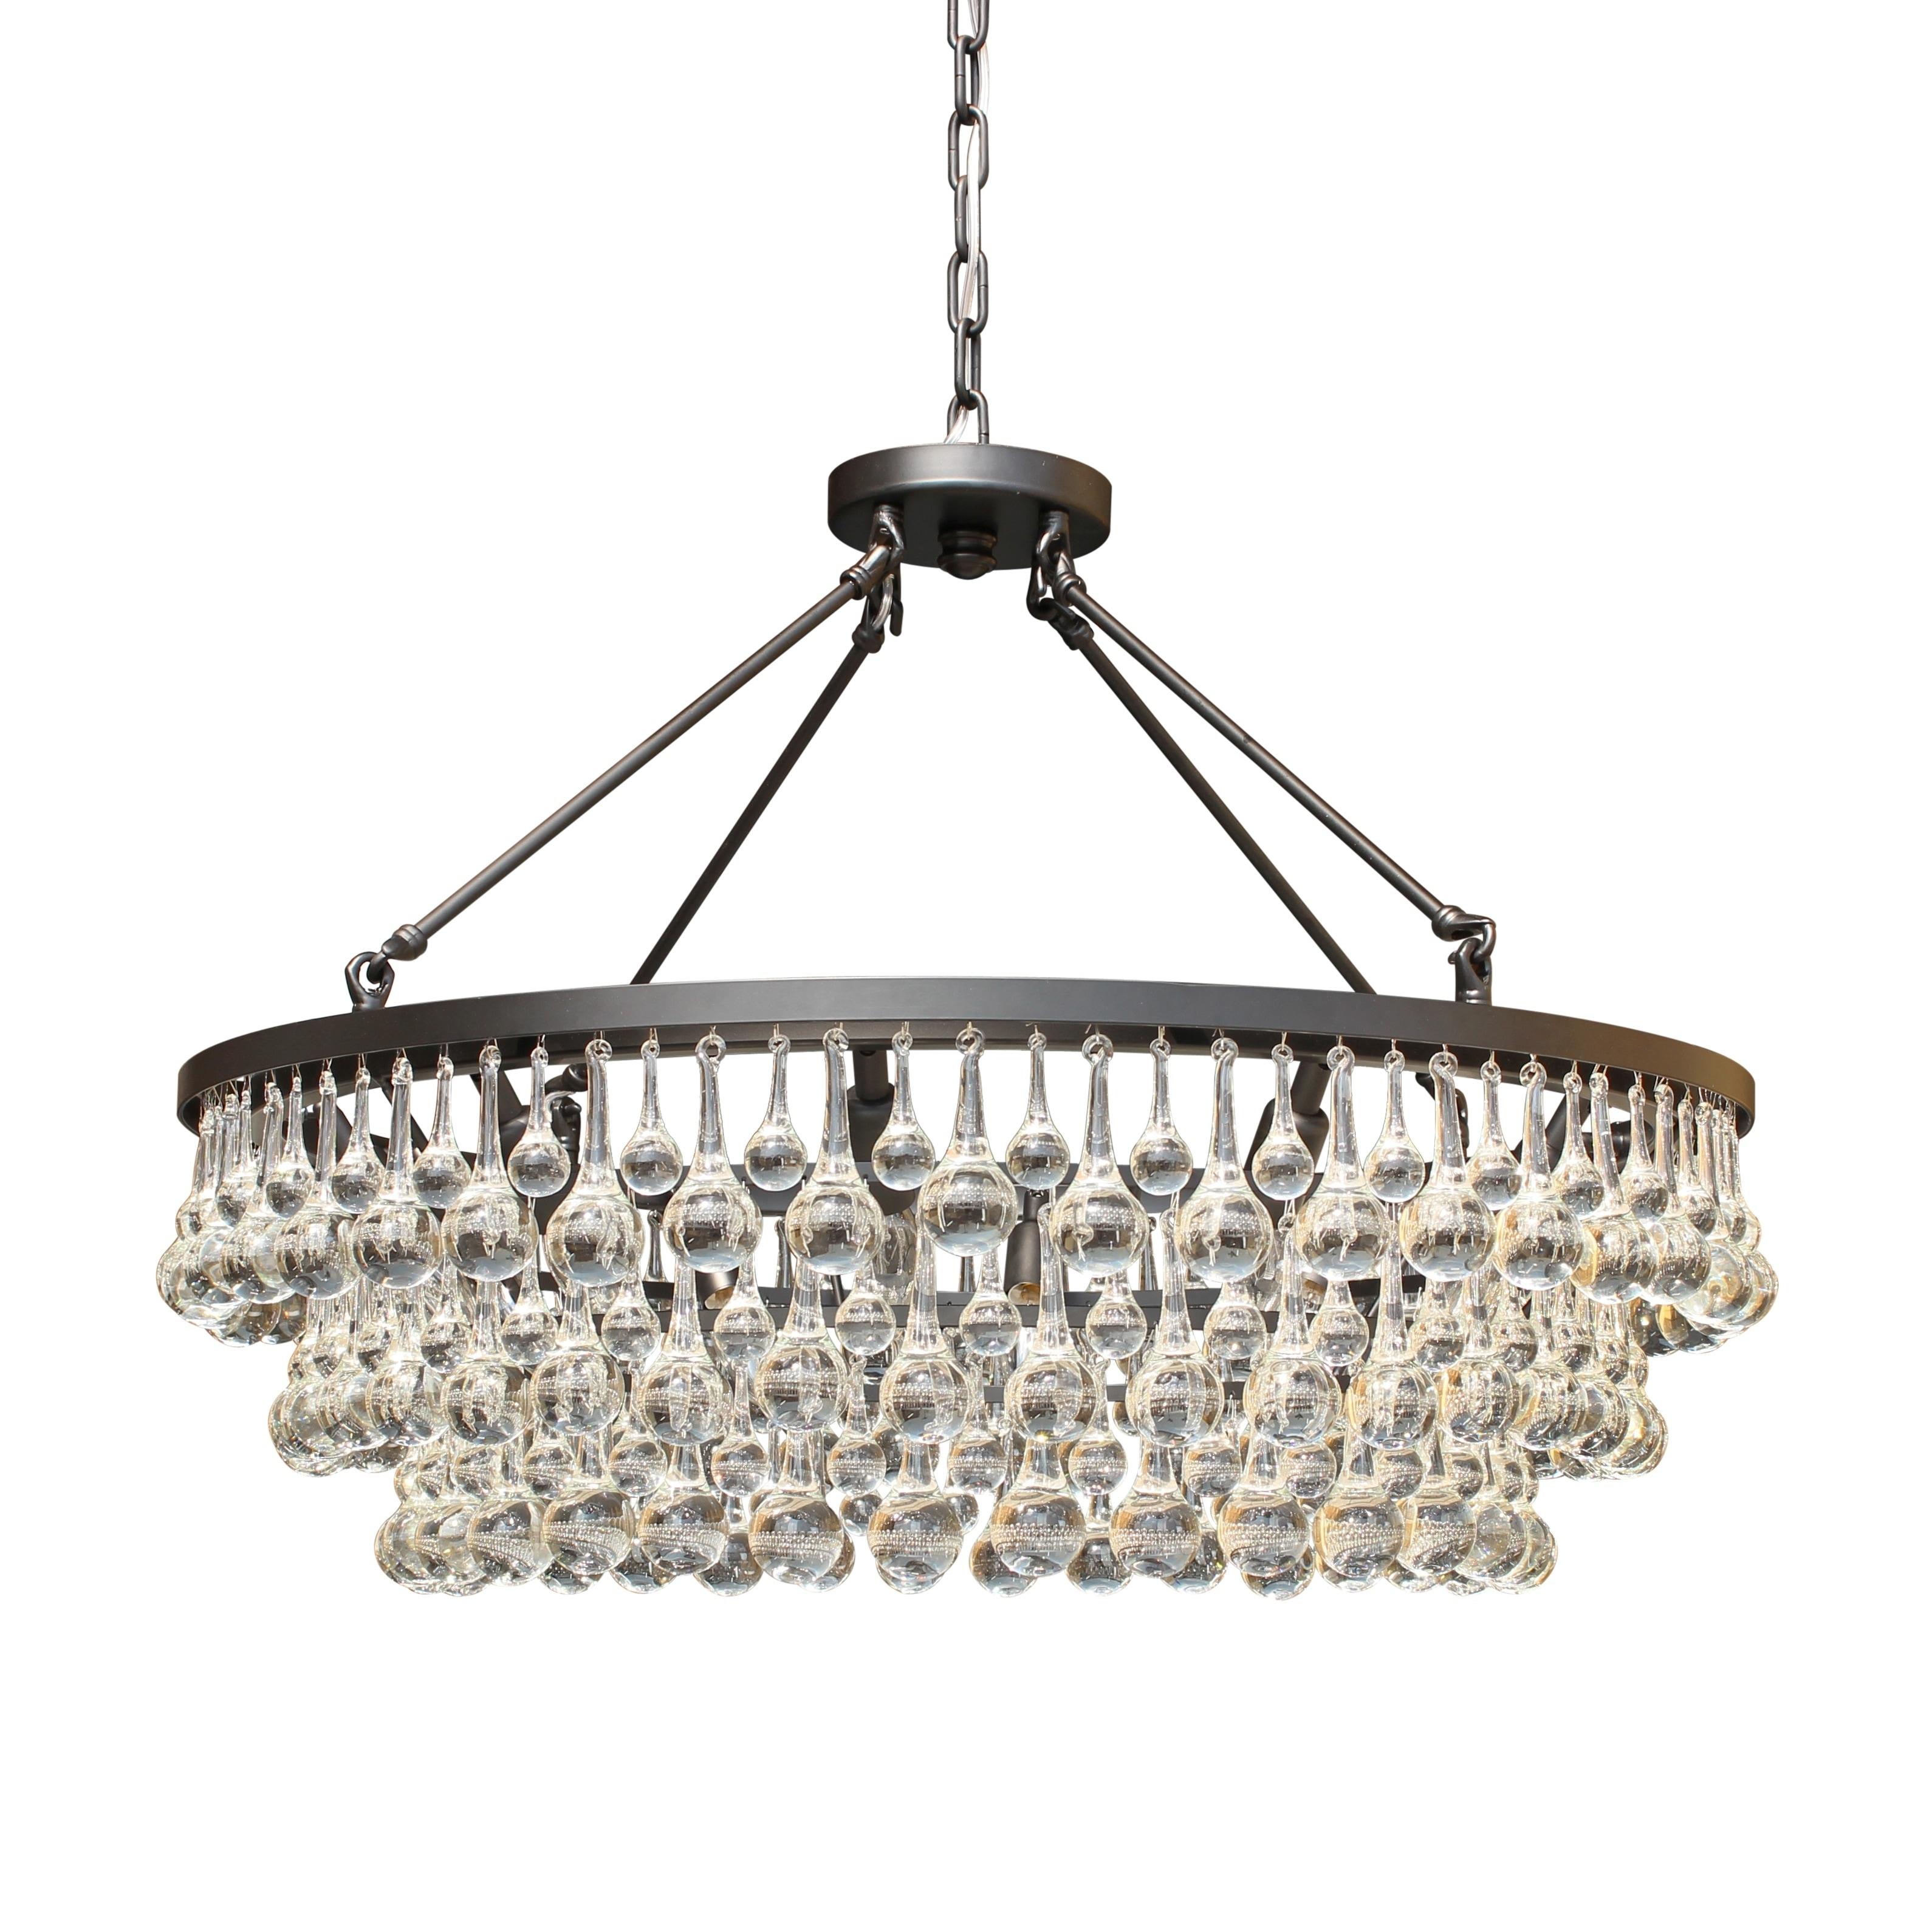 Celeste Black Iron and Glass Crystal 10-light Chandelier - Free ...